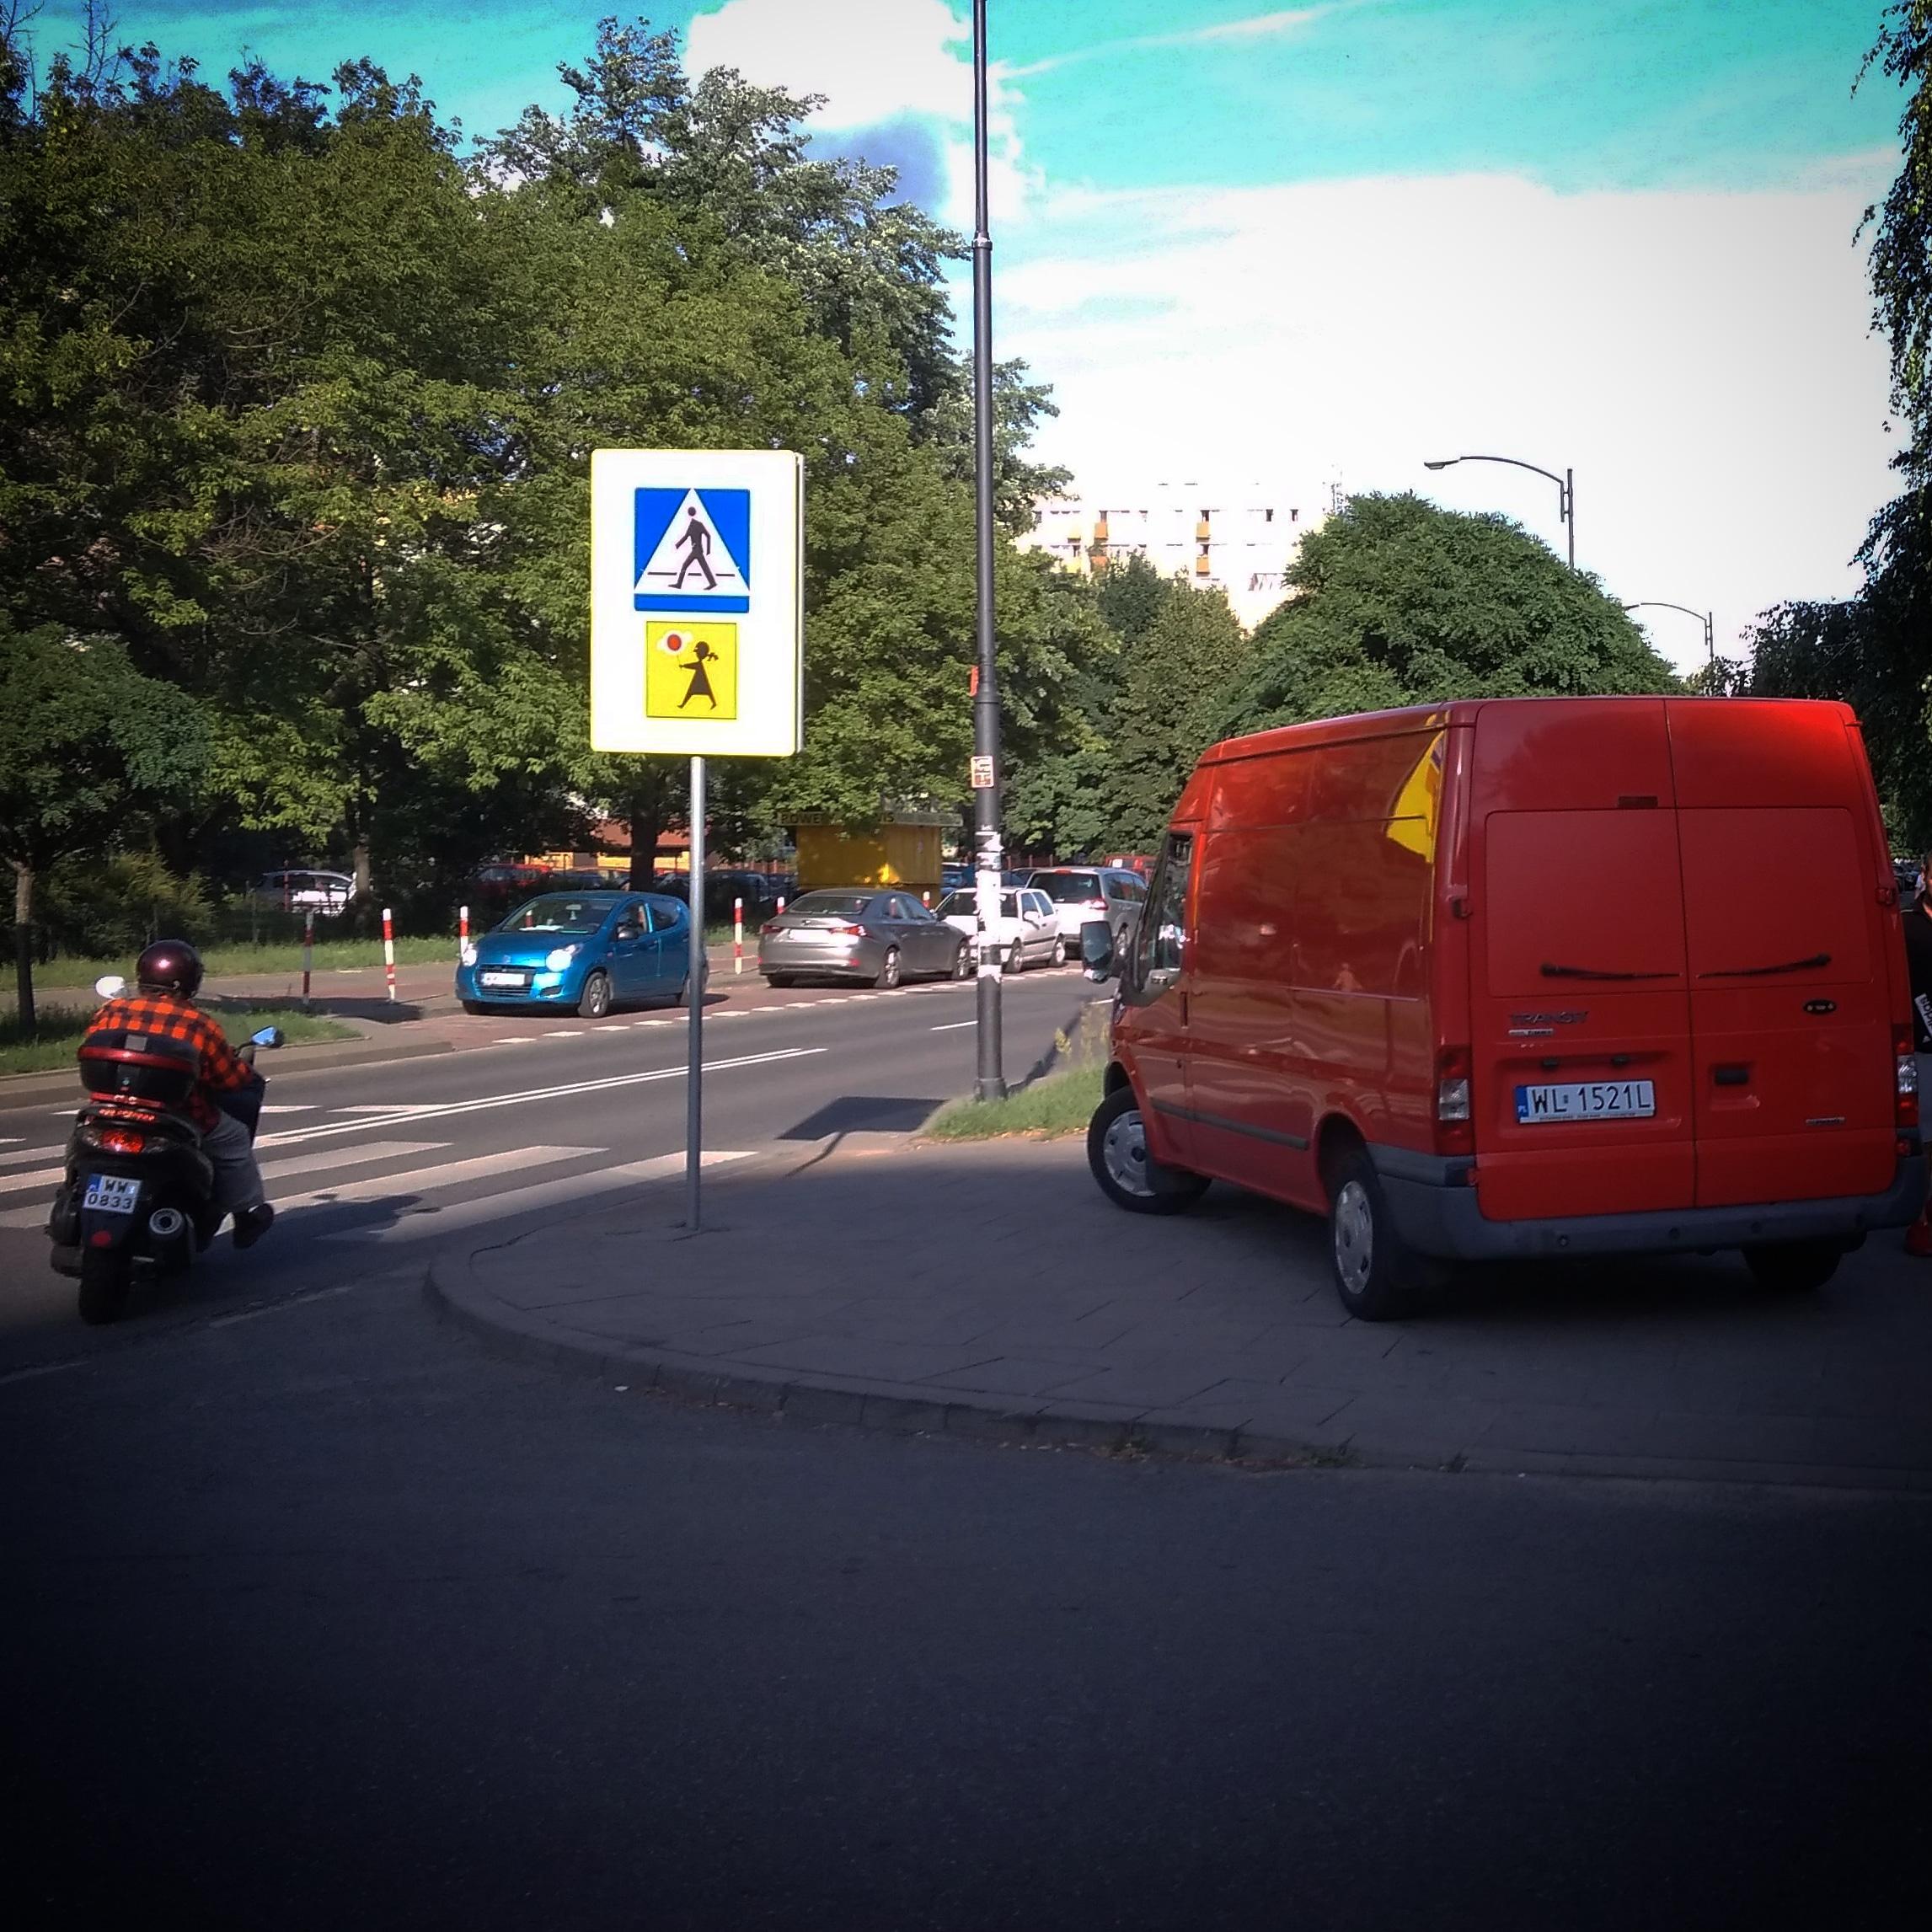 #92: Stop Cham Warszawa